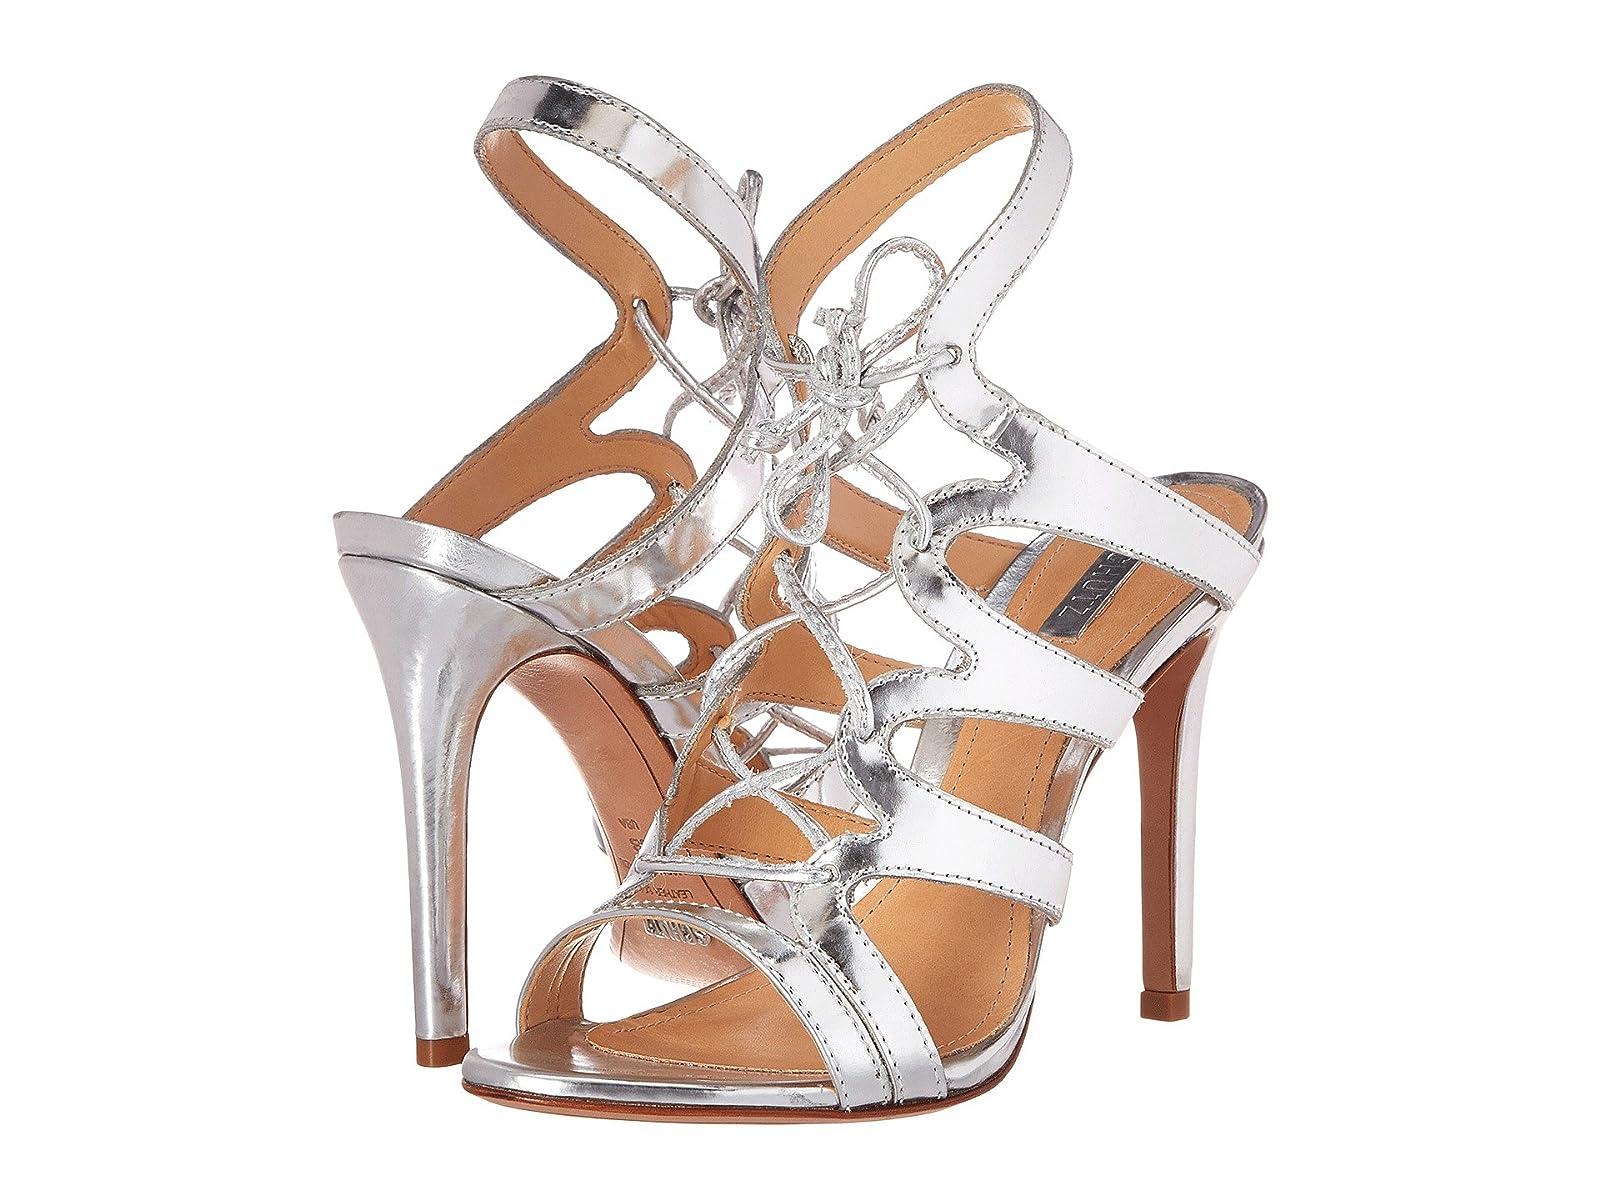 Schutz Spring HeelCheap and distinctive eye-catching shoes